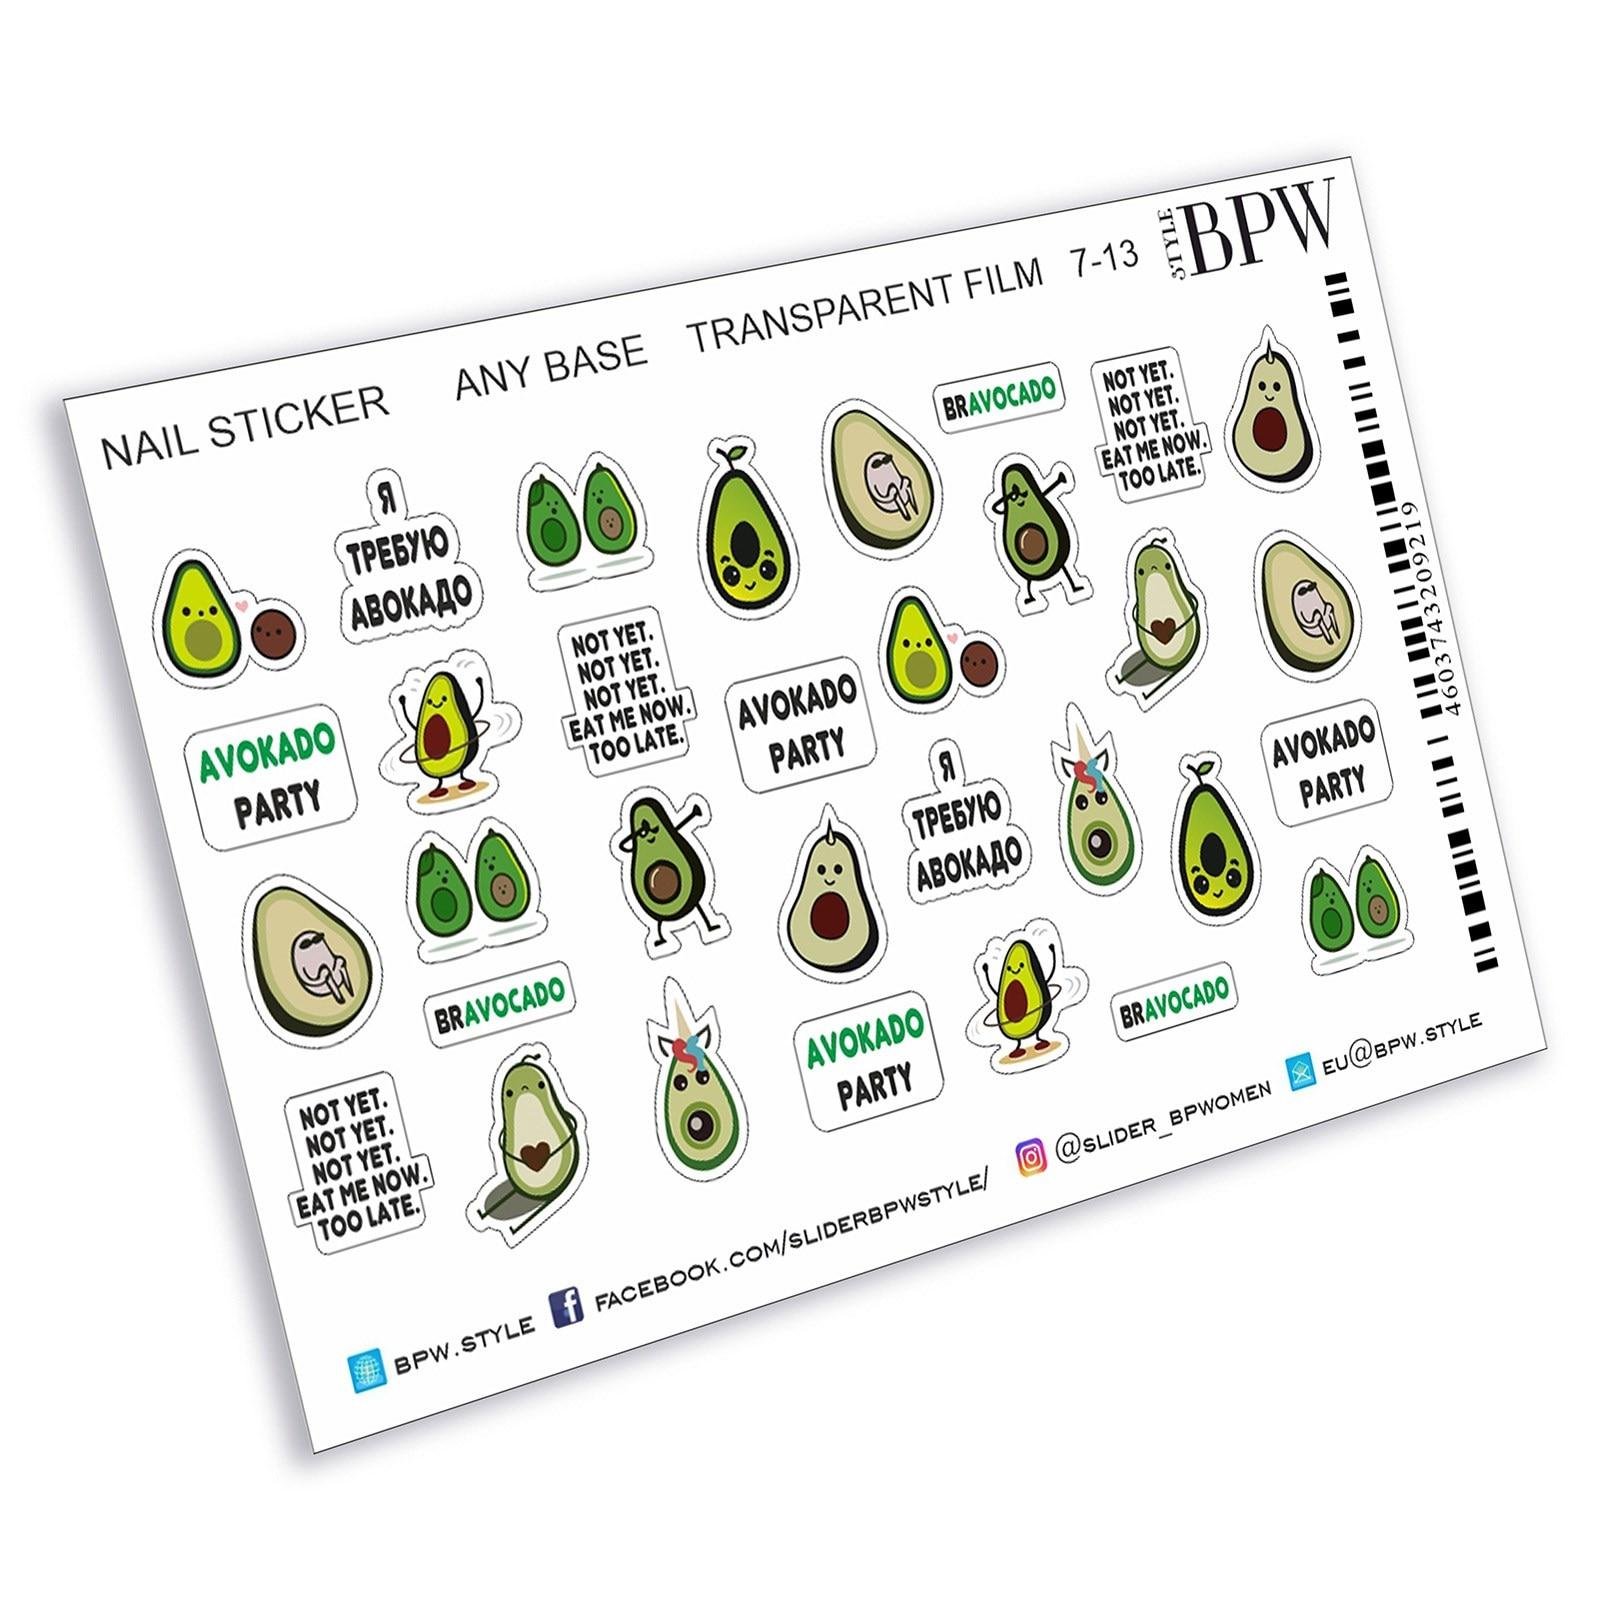 Nail Stickers Avocado, BPW. Style, Nail Stickers, Ns7-13